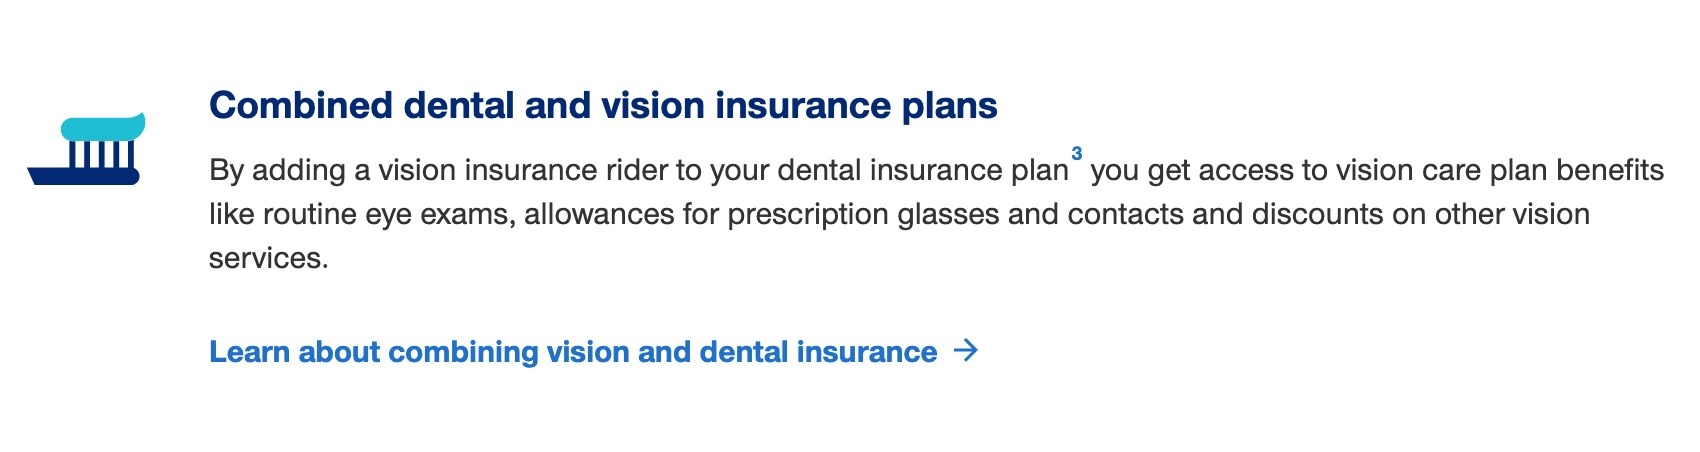 Screenshot of dental and vision plans